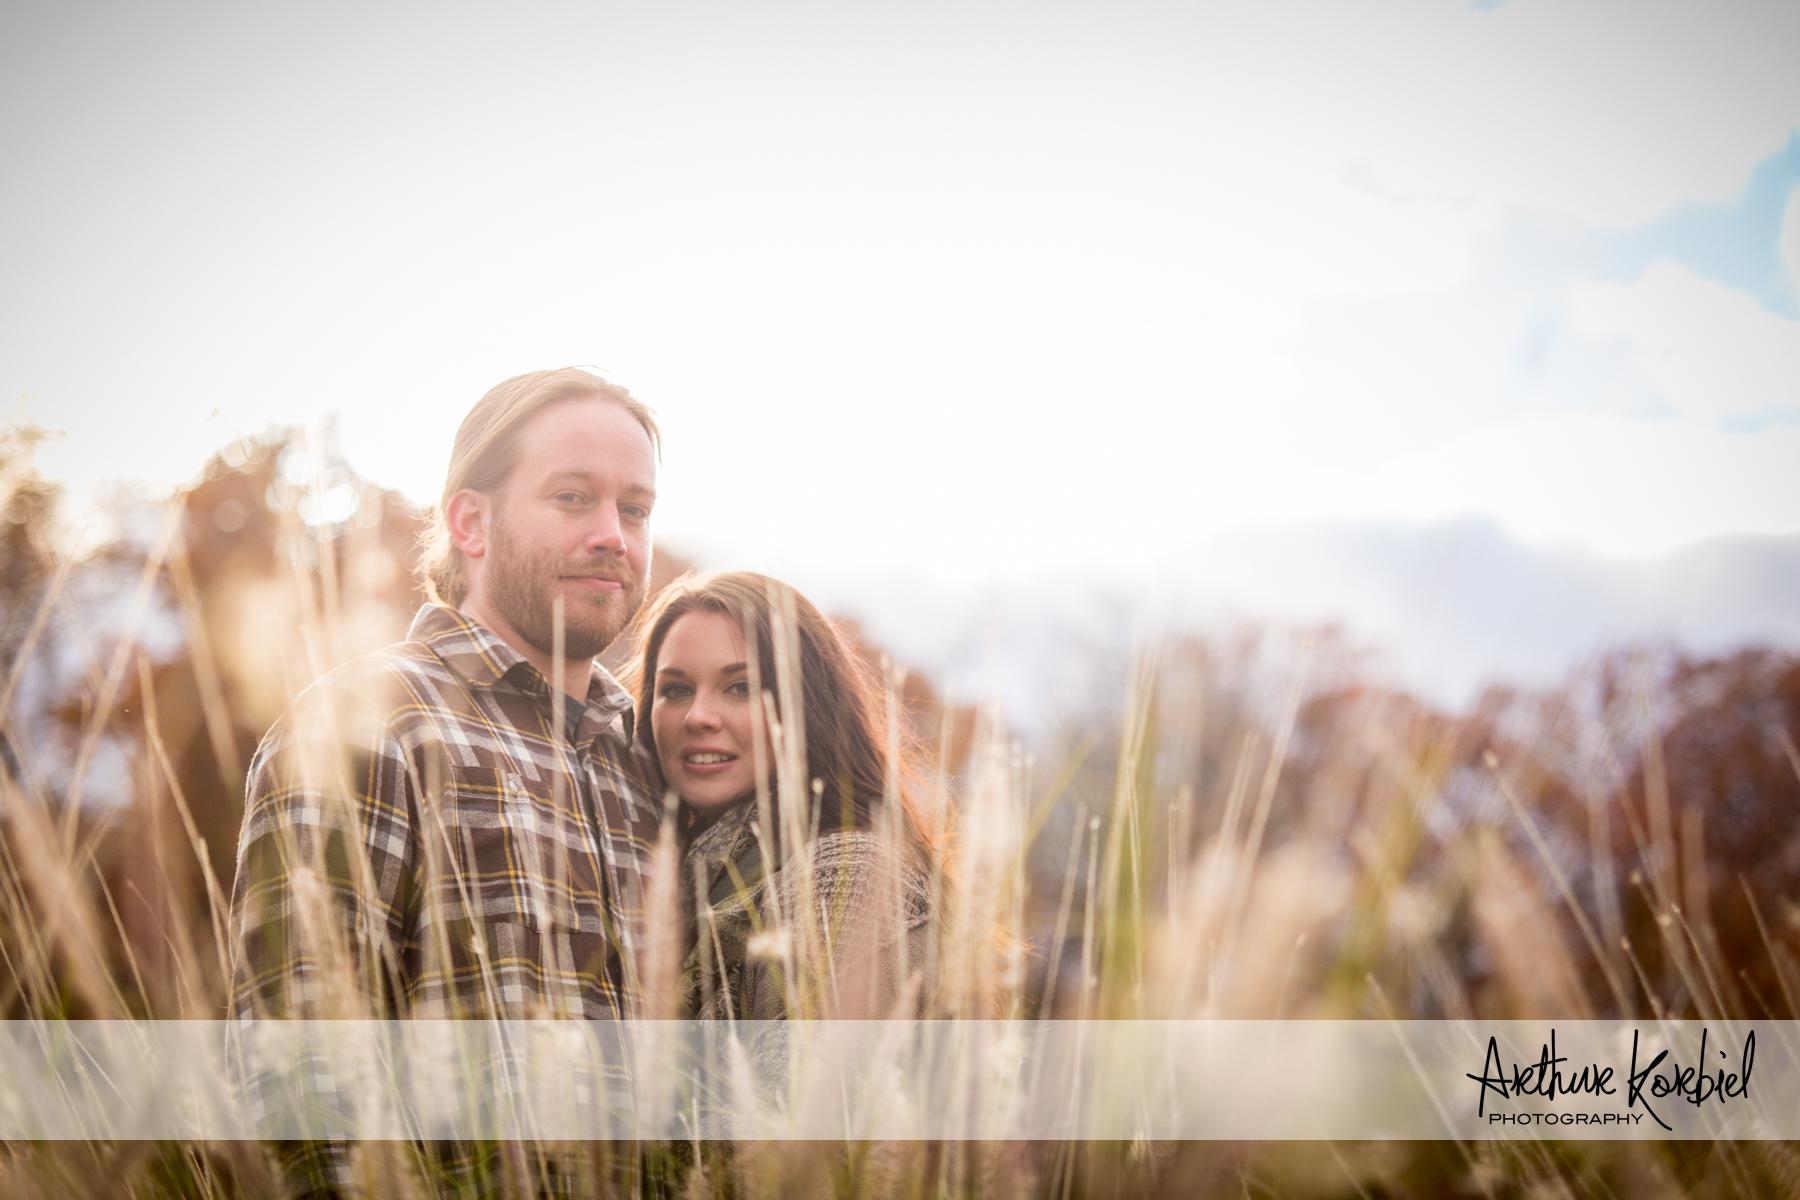 Arthur Korbiel Photography - London Engagement Photographer - Heather & Addison-001.jpg